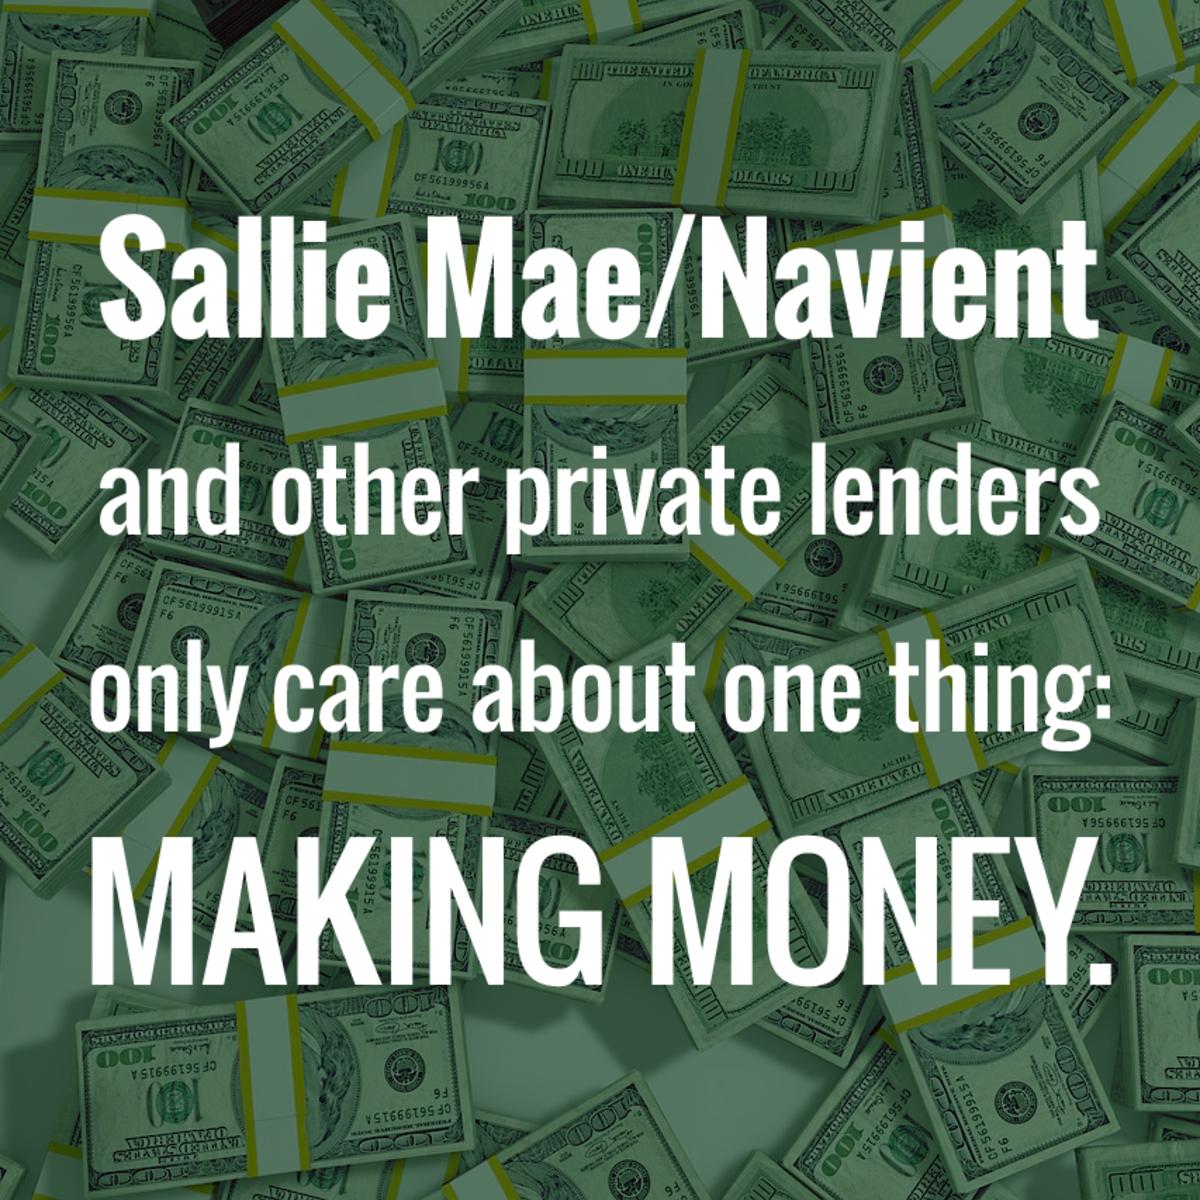 Sallie Mae/Navient和其他私人贷款机构只关心一件事:赚钱。